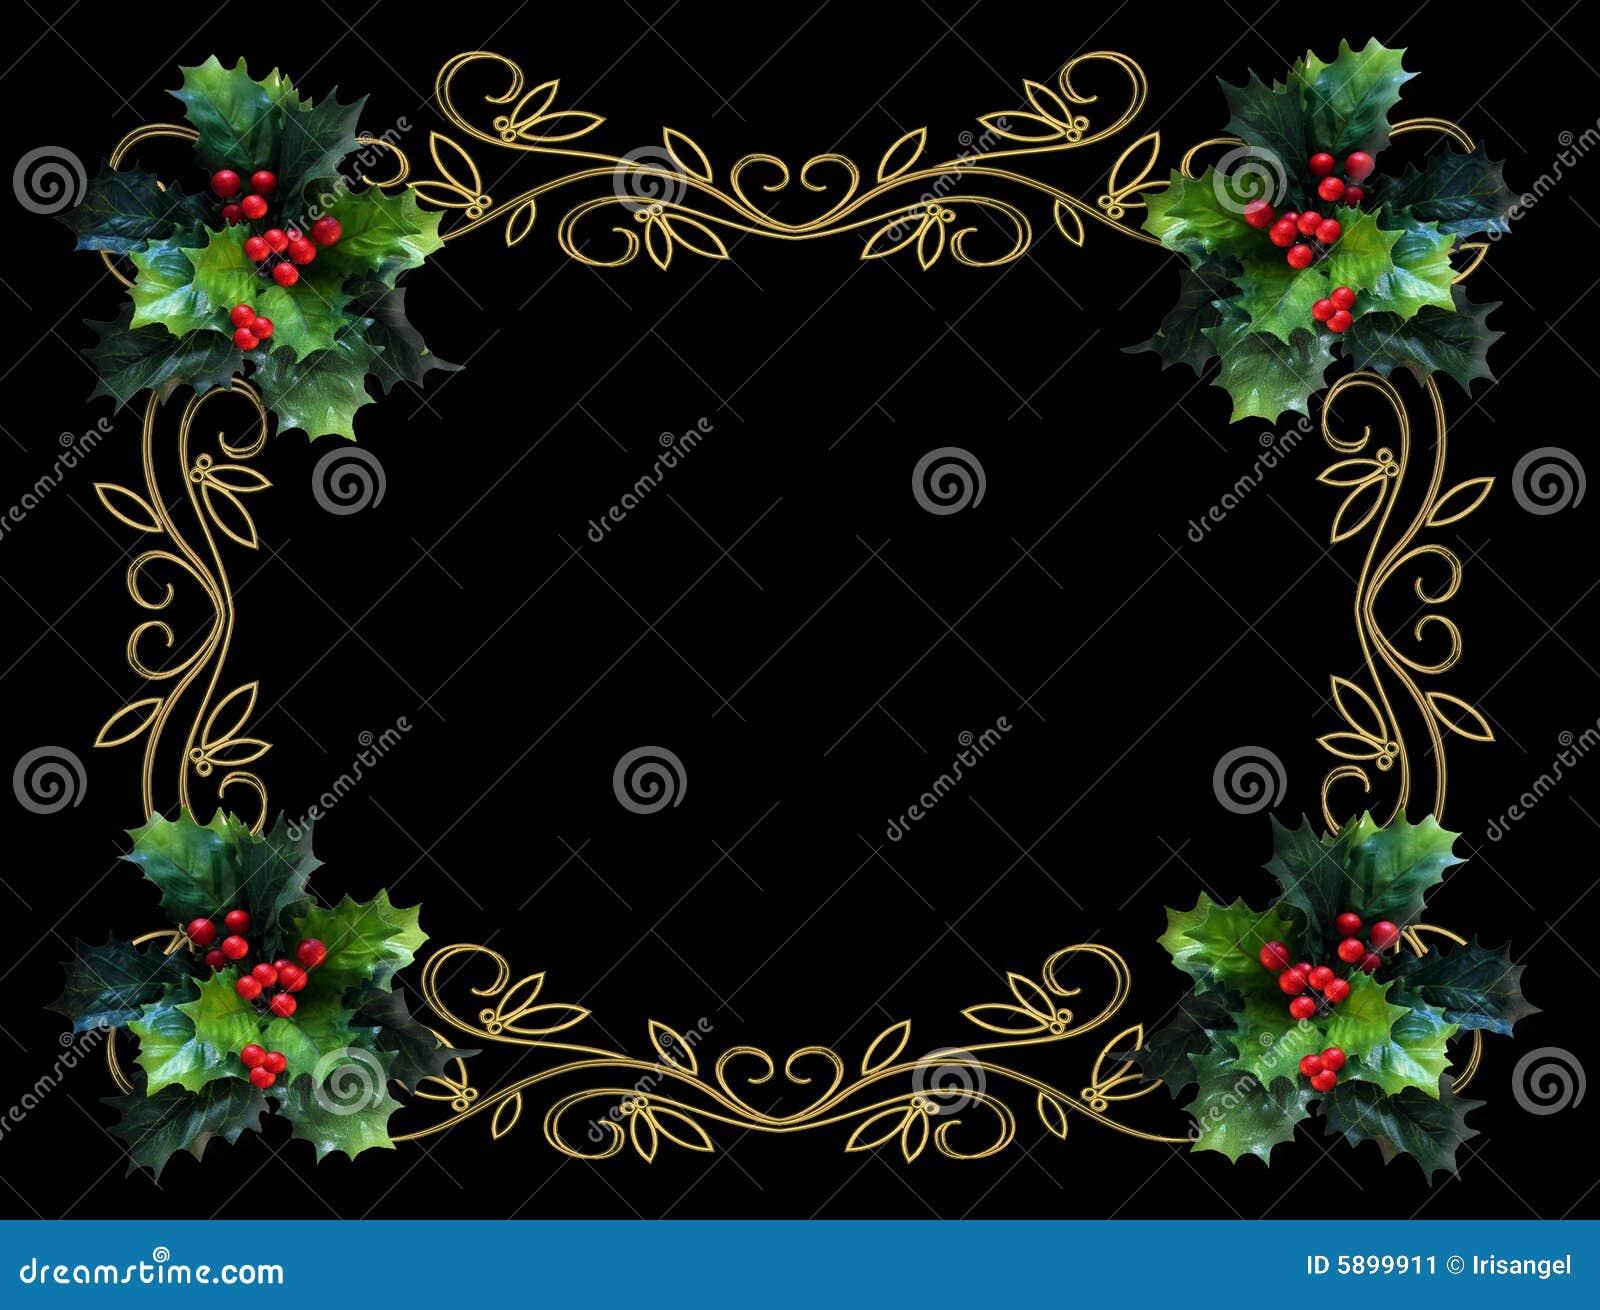 christmas holly border on black stock illustration